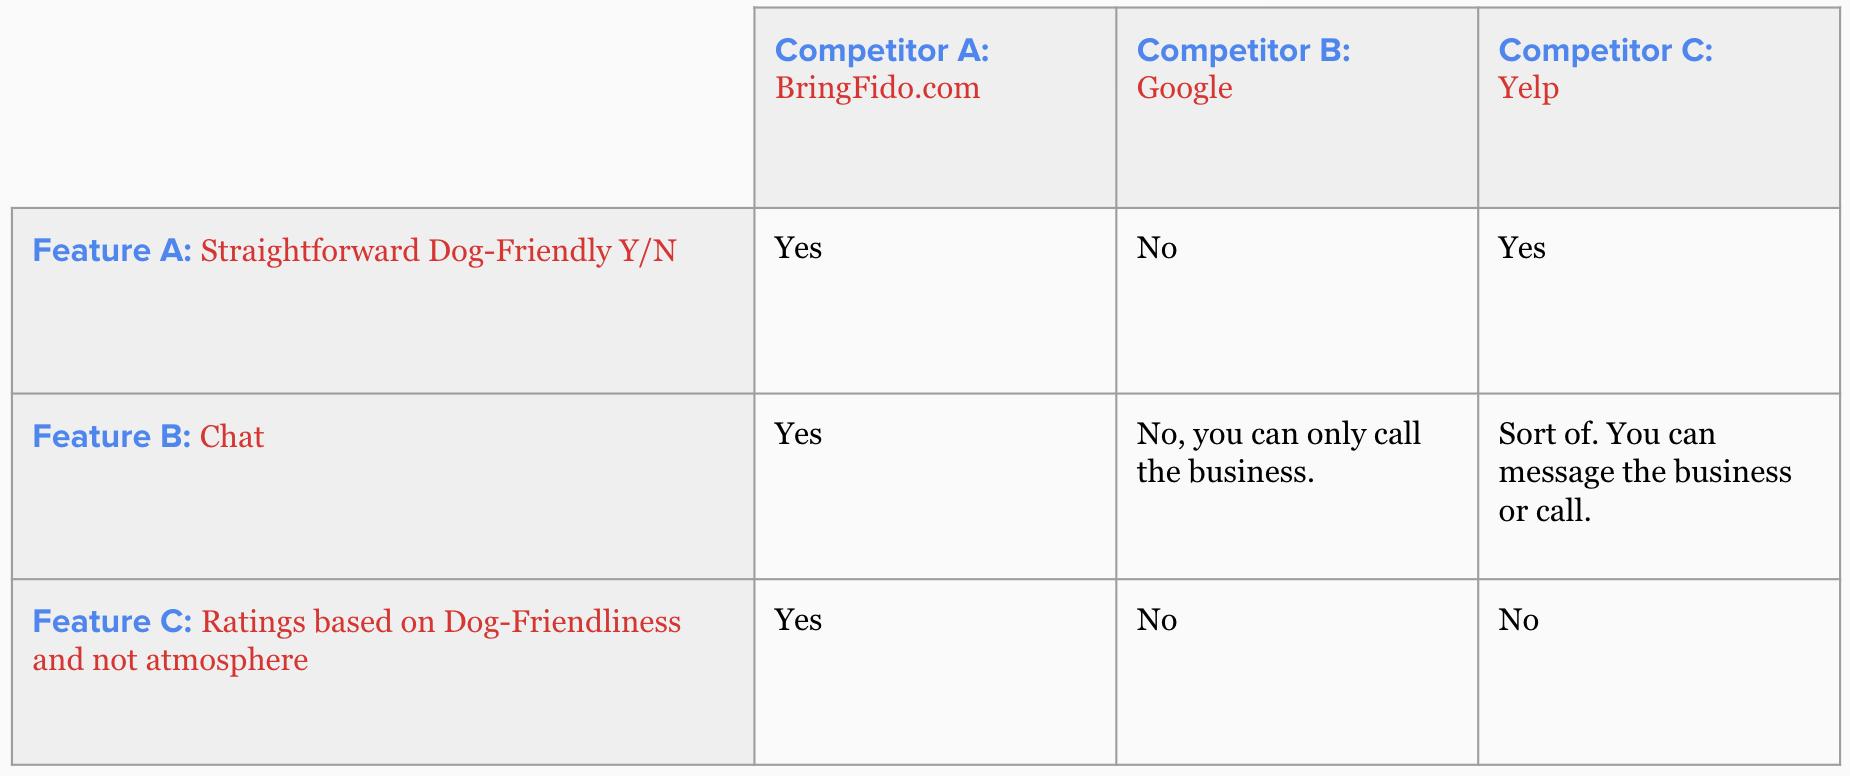 Feature Comparison Matrix for Biggest Competitors